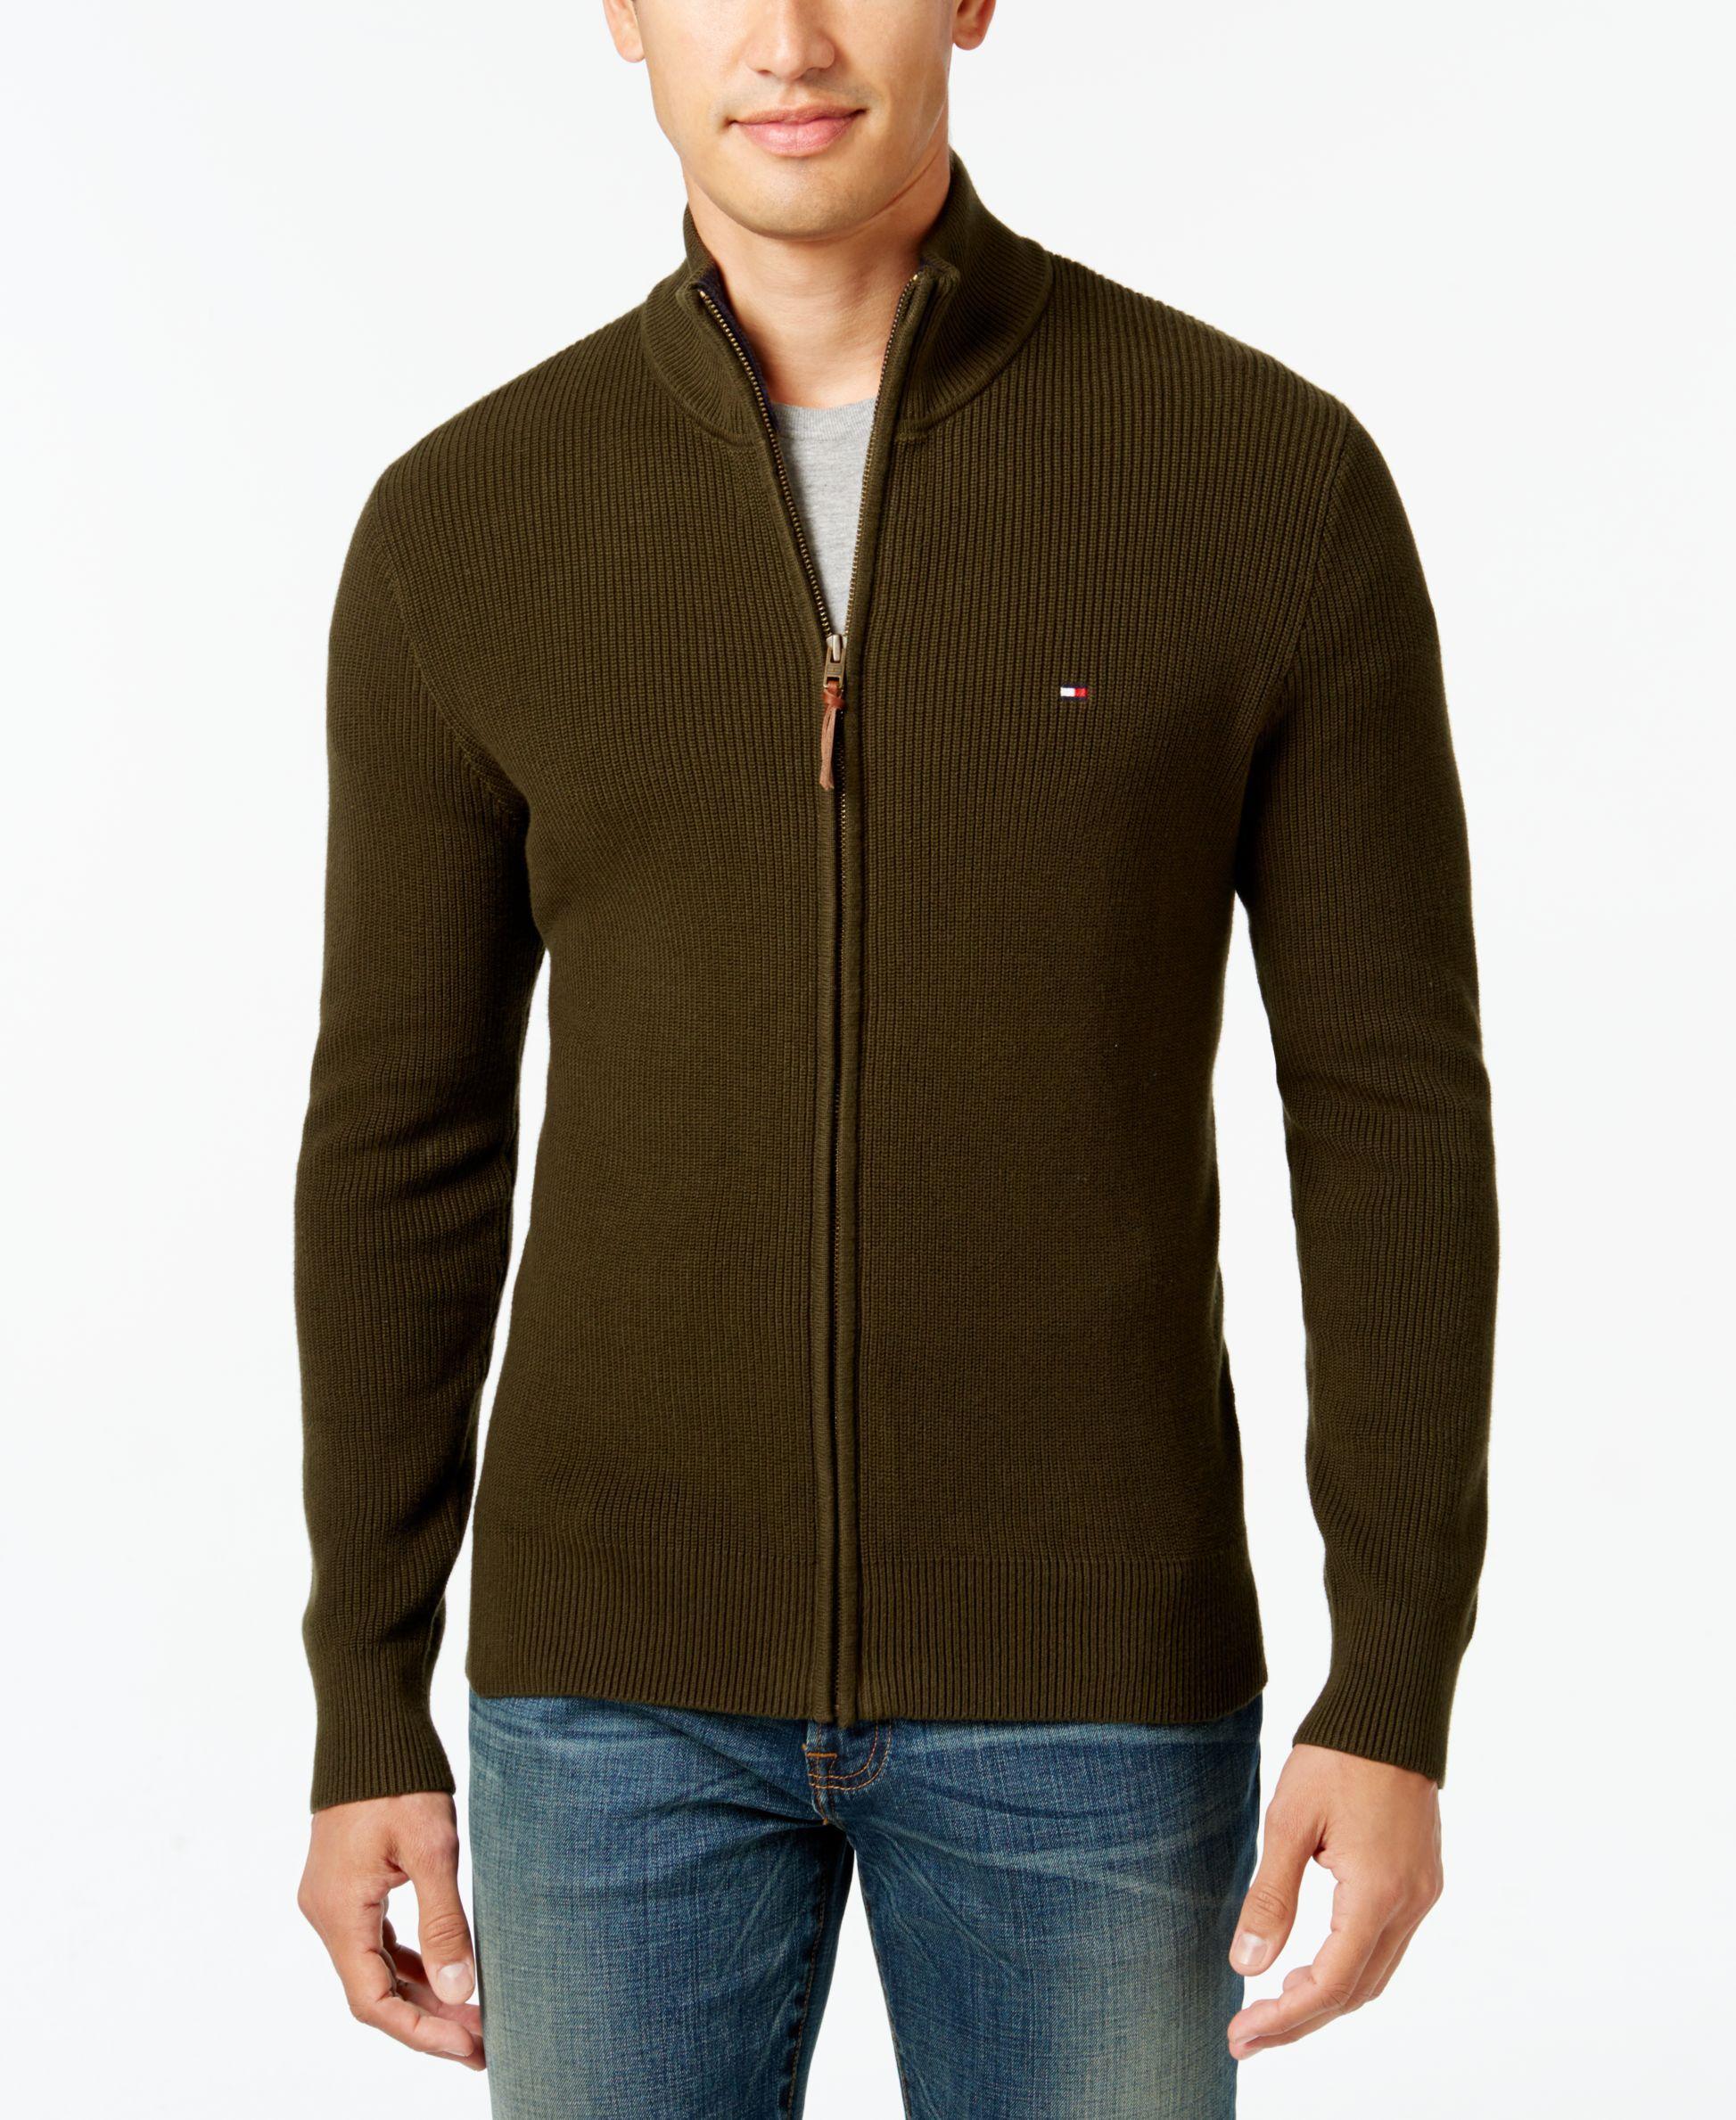 953124d88e0b Tommy Hilfiger Men s Fabian Full-Zip Sweater